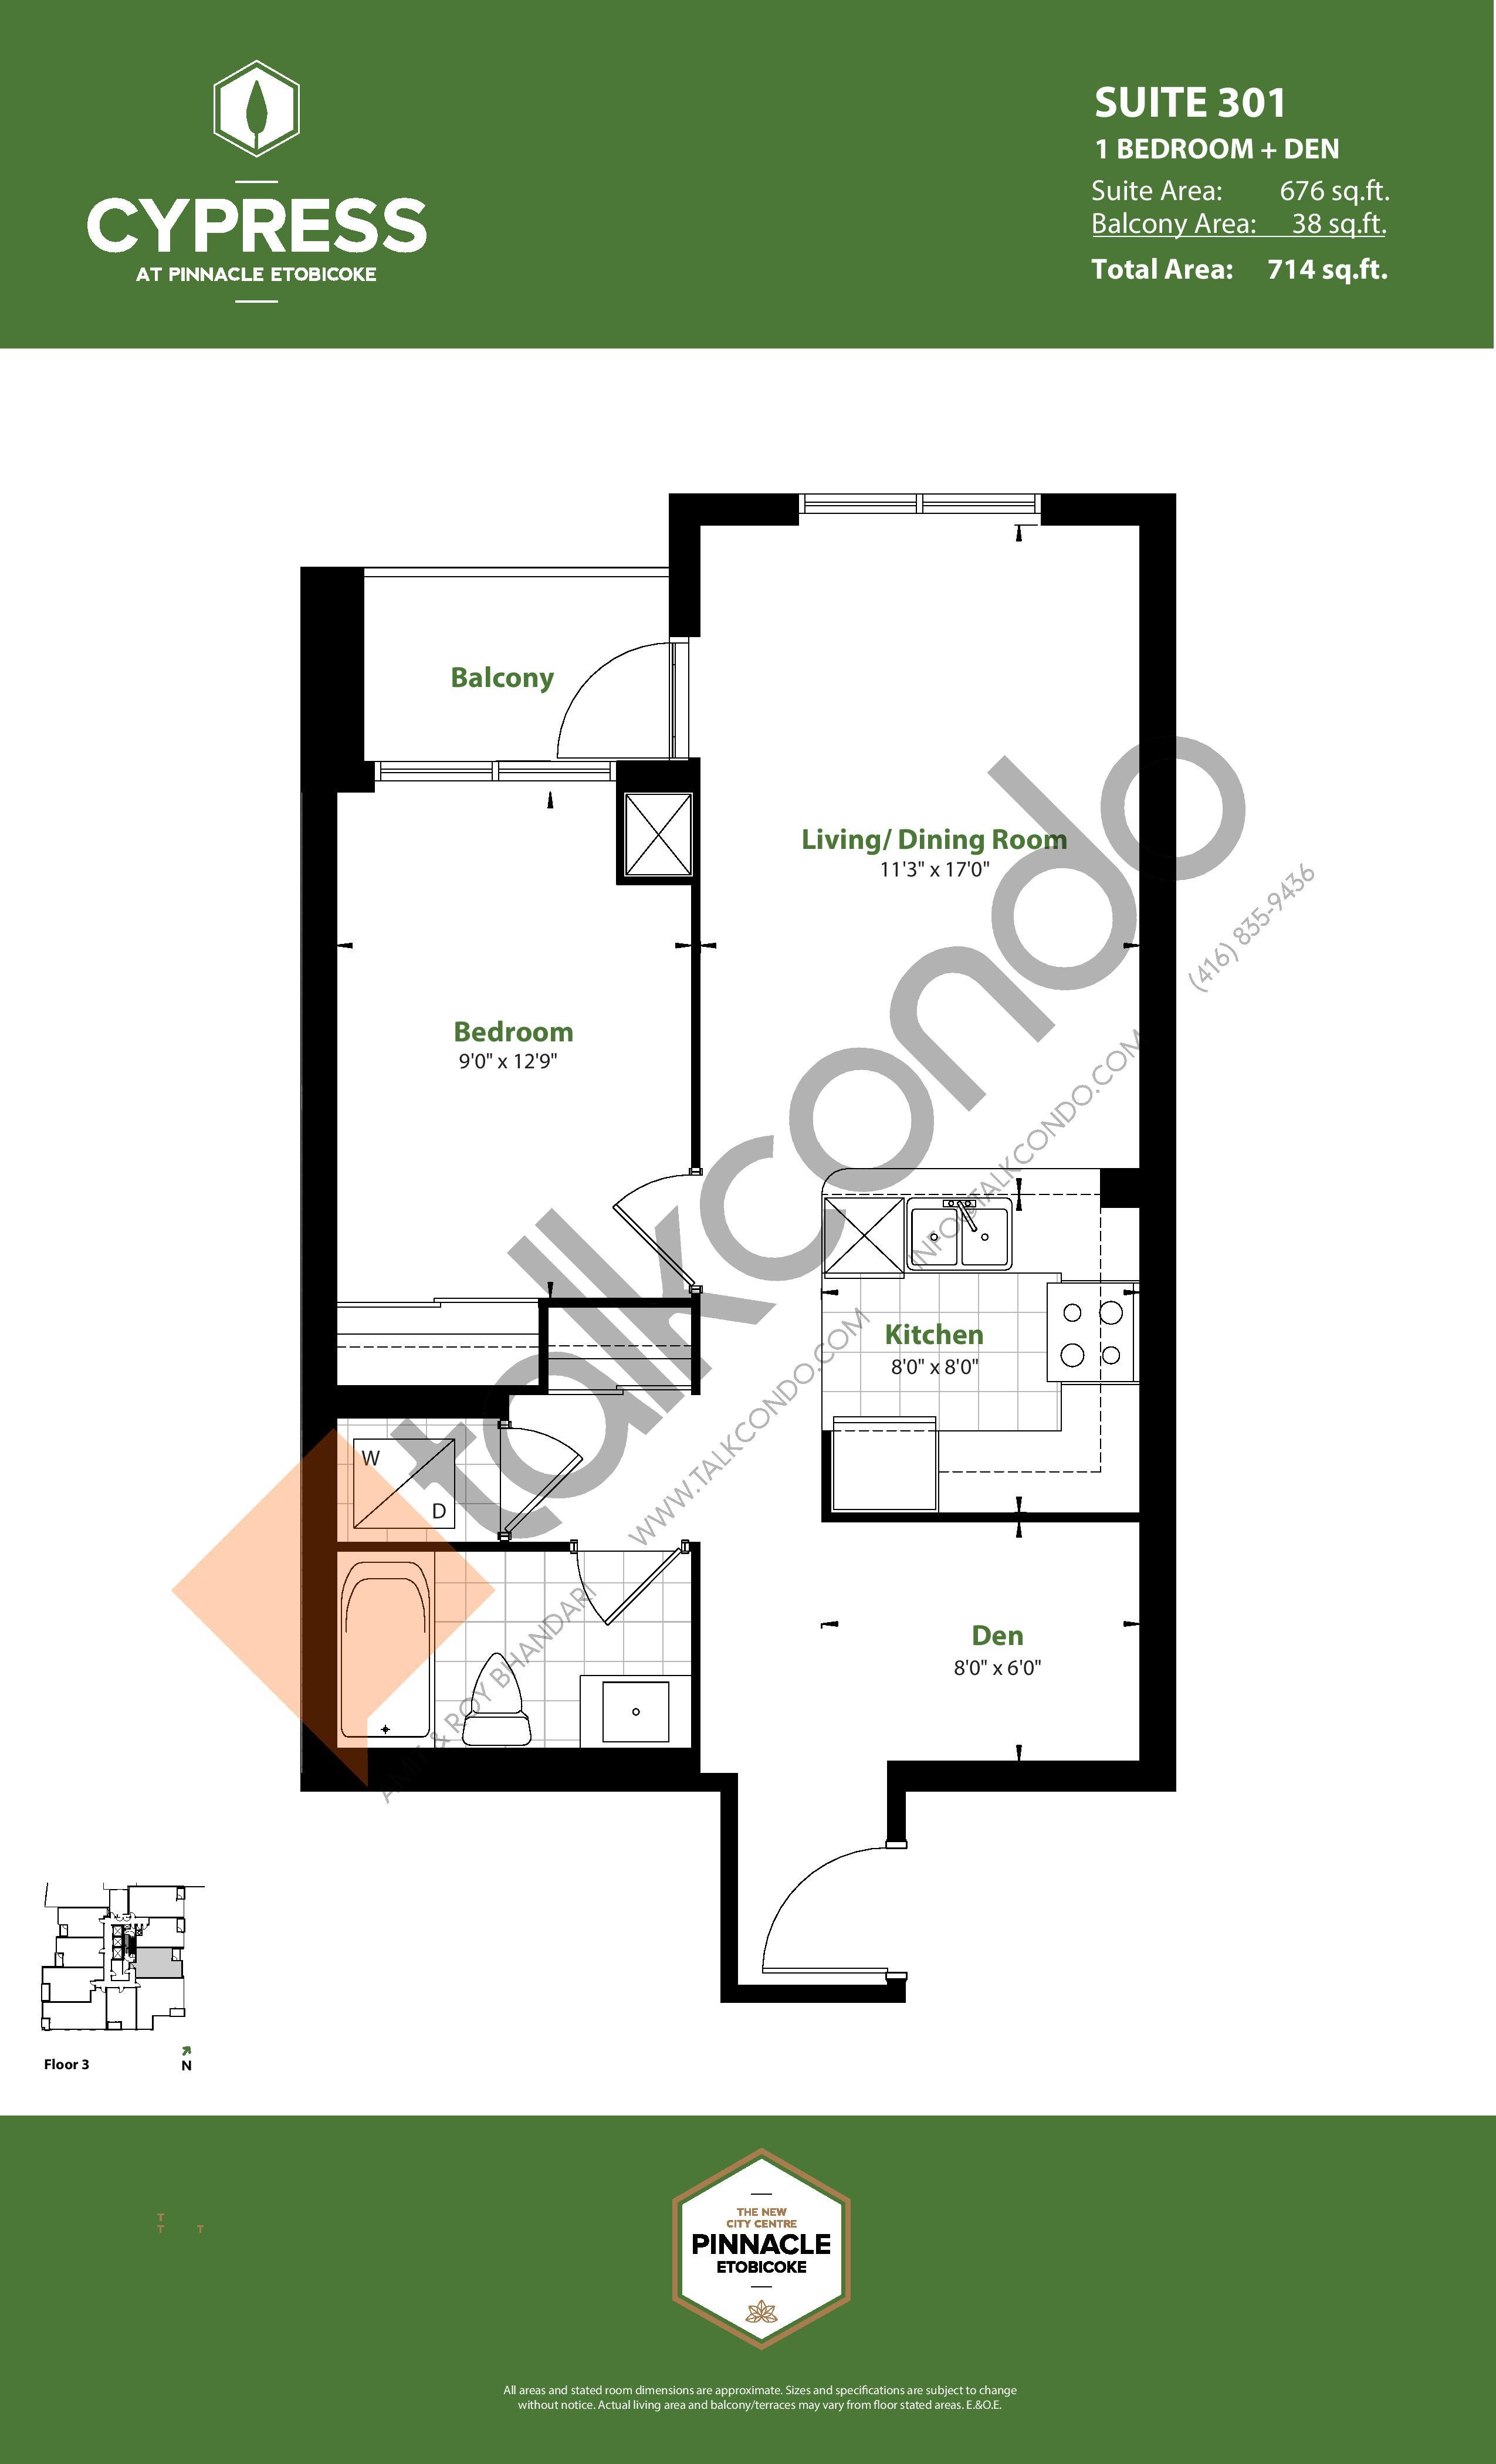 Suite 301 Floor Plan at Cypress at Pinnacle Etobicoke - 676 sq.ft